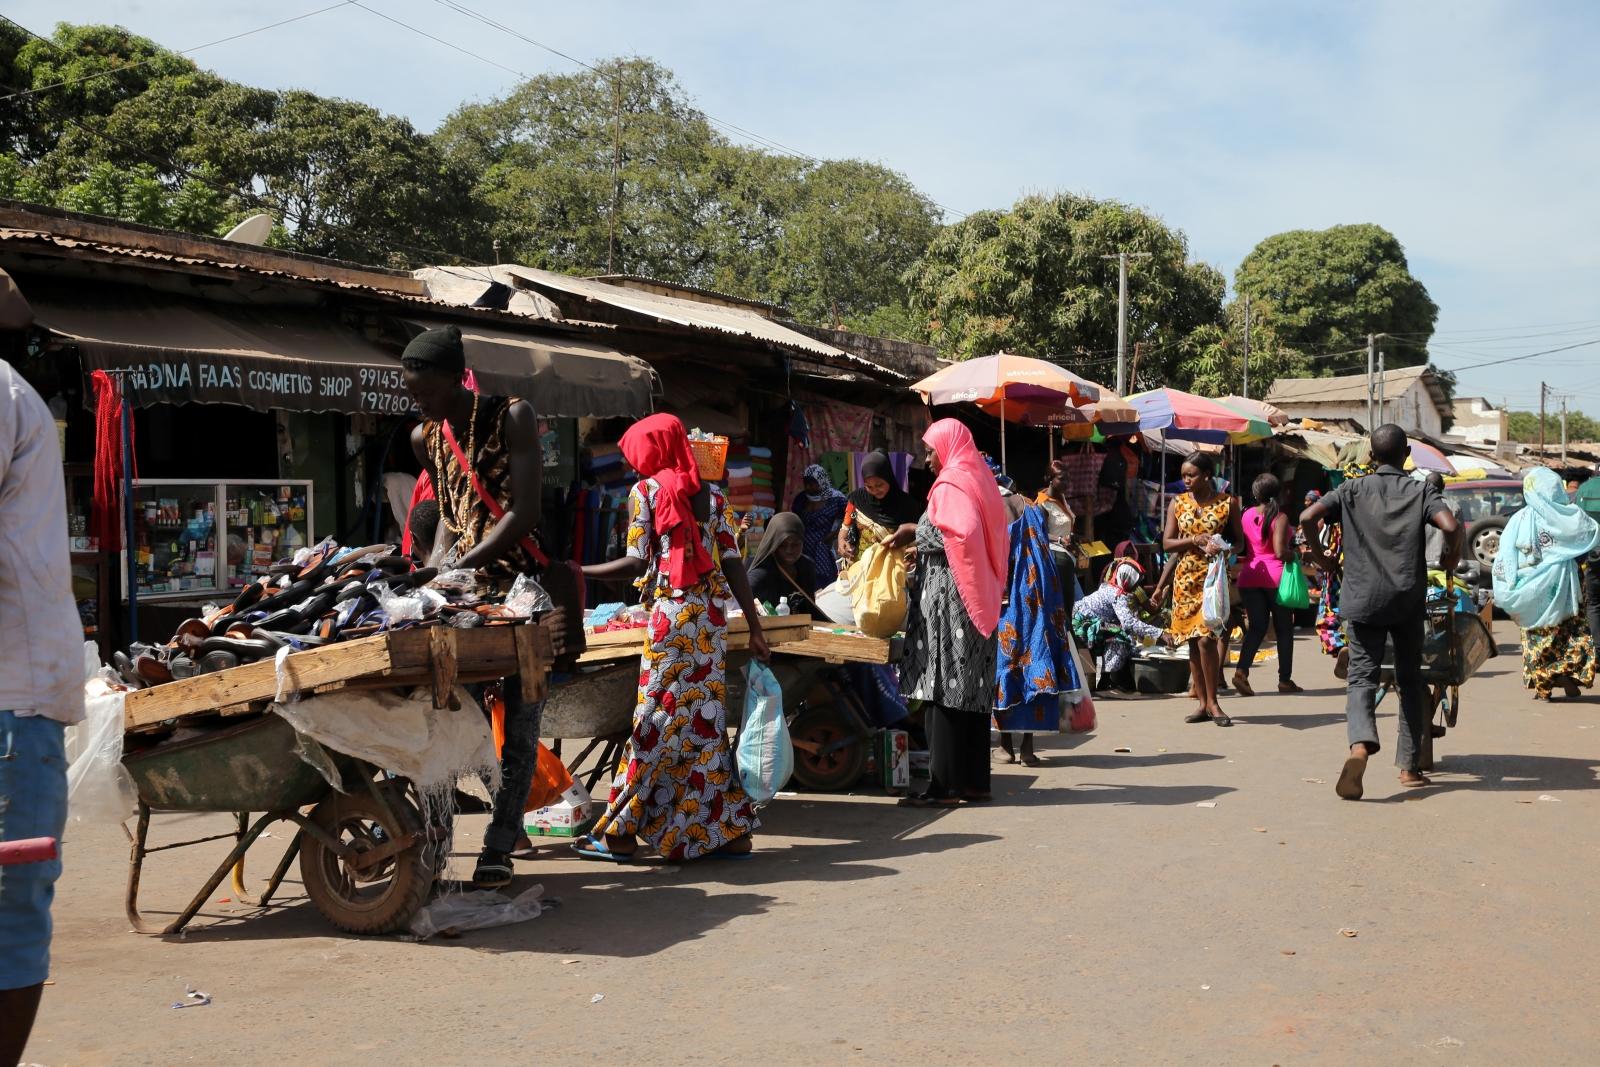 Tourists flee West African hot-spot as civil unrest threatens